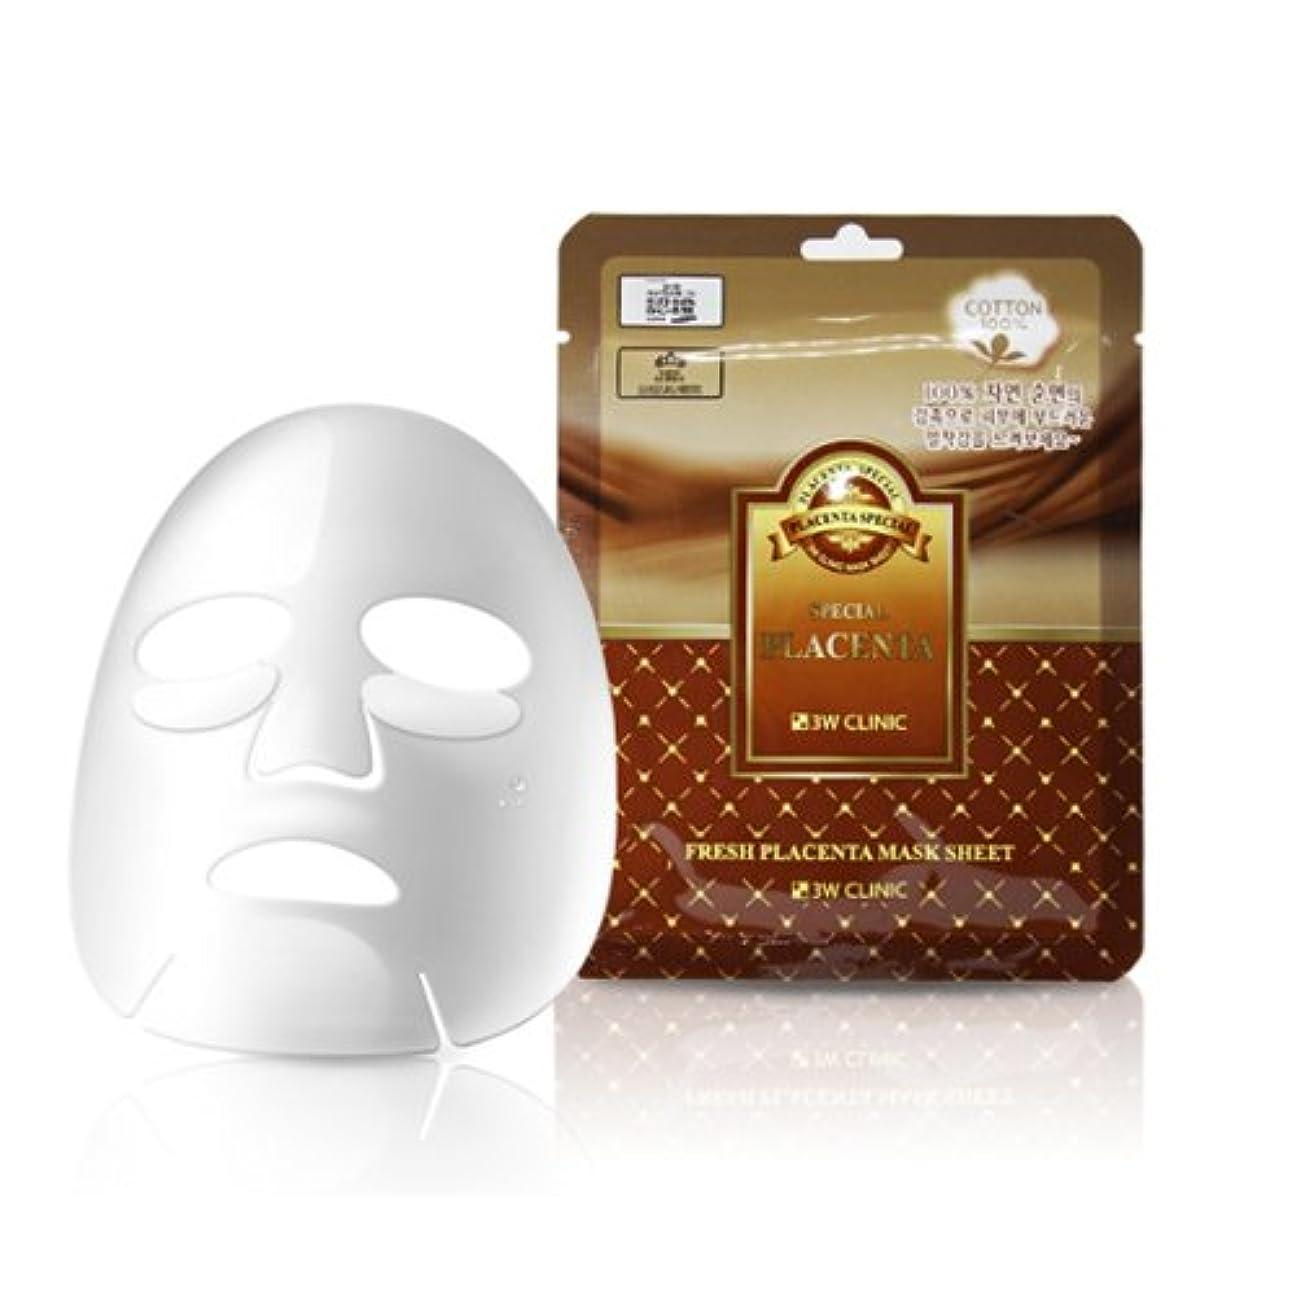 3Wクリニック[韓国コスメ3w Clinic]Premium Placenta Mask Pack プレミアムプラセンタシートマスクパック10枚[並行輸入品]